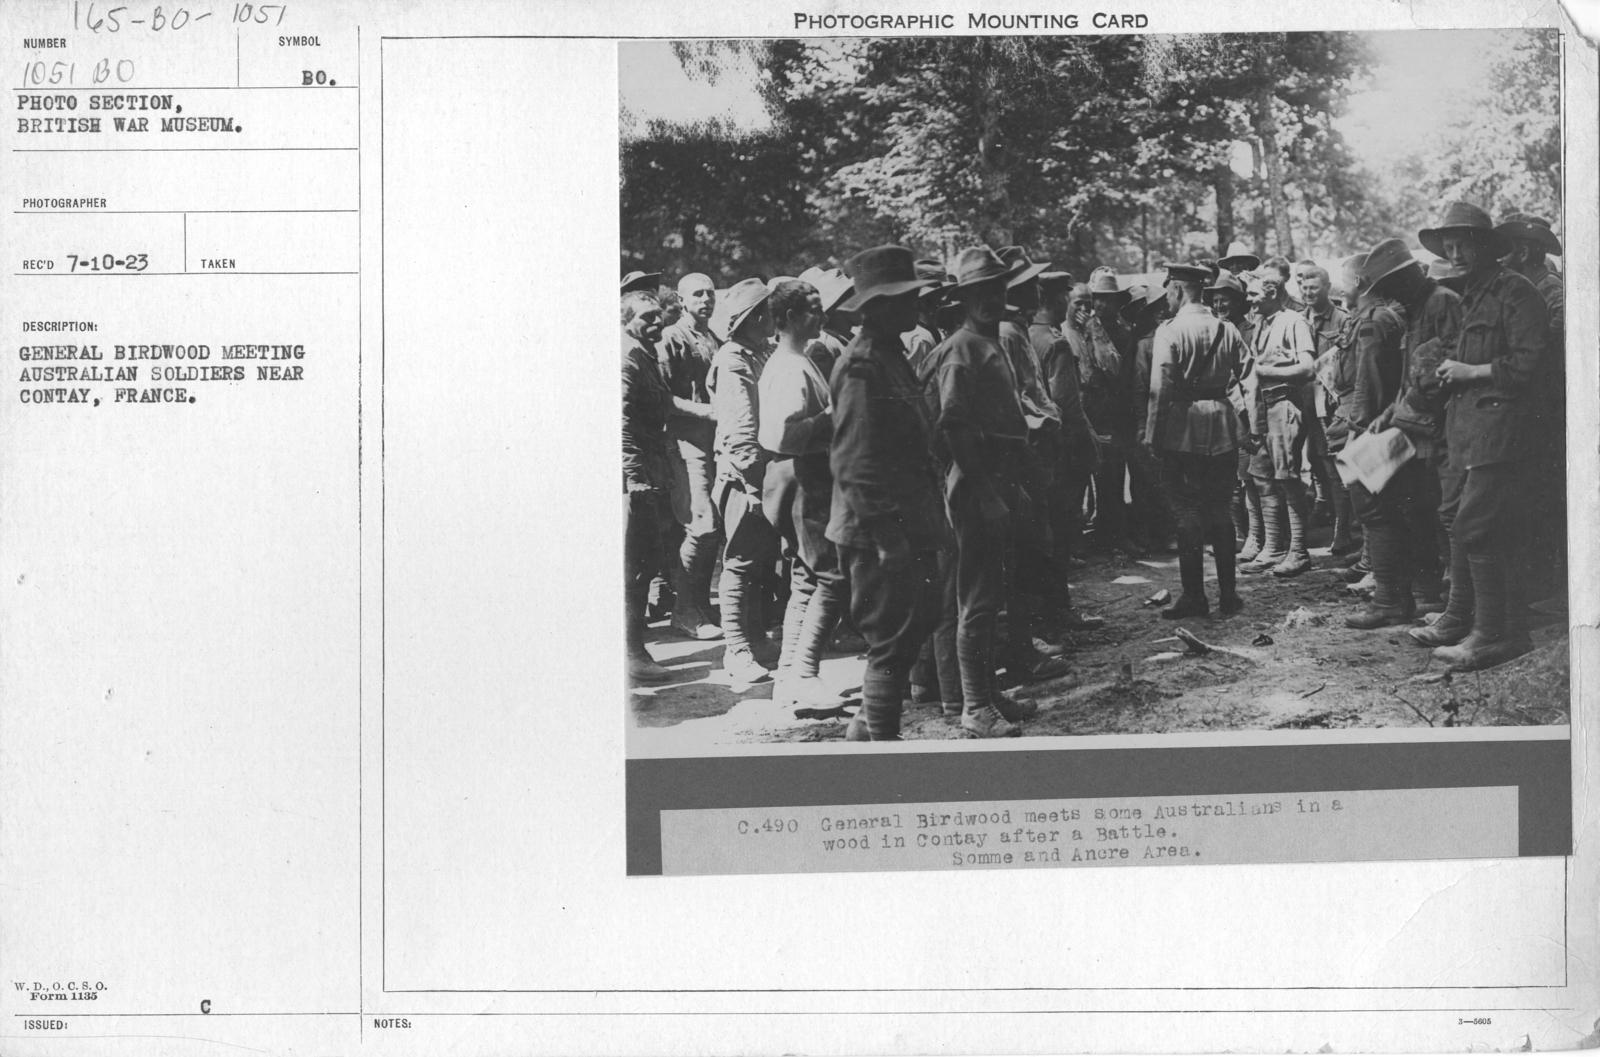 General Birdwood meeting Australian soldiers near Contay, France